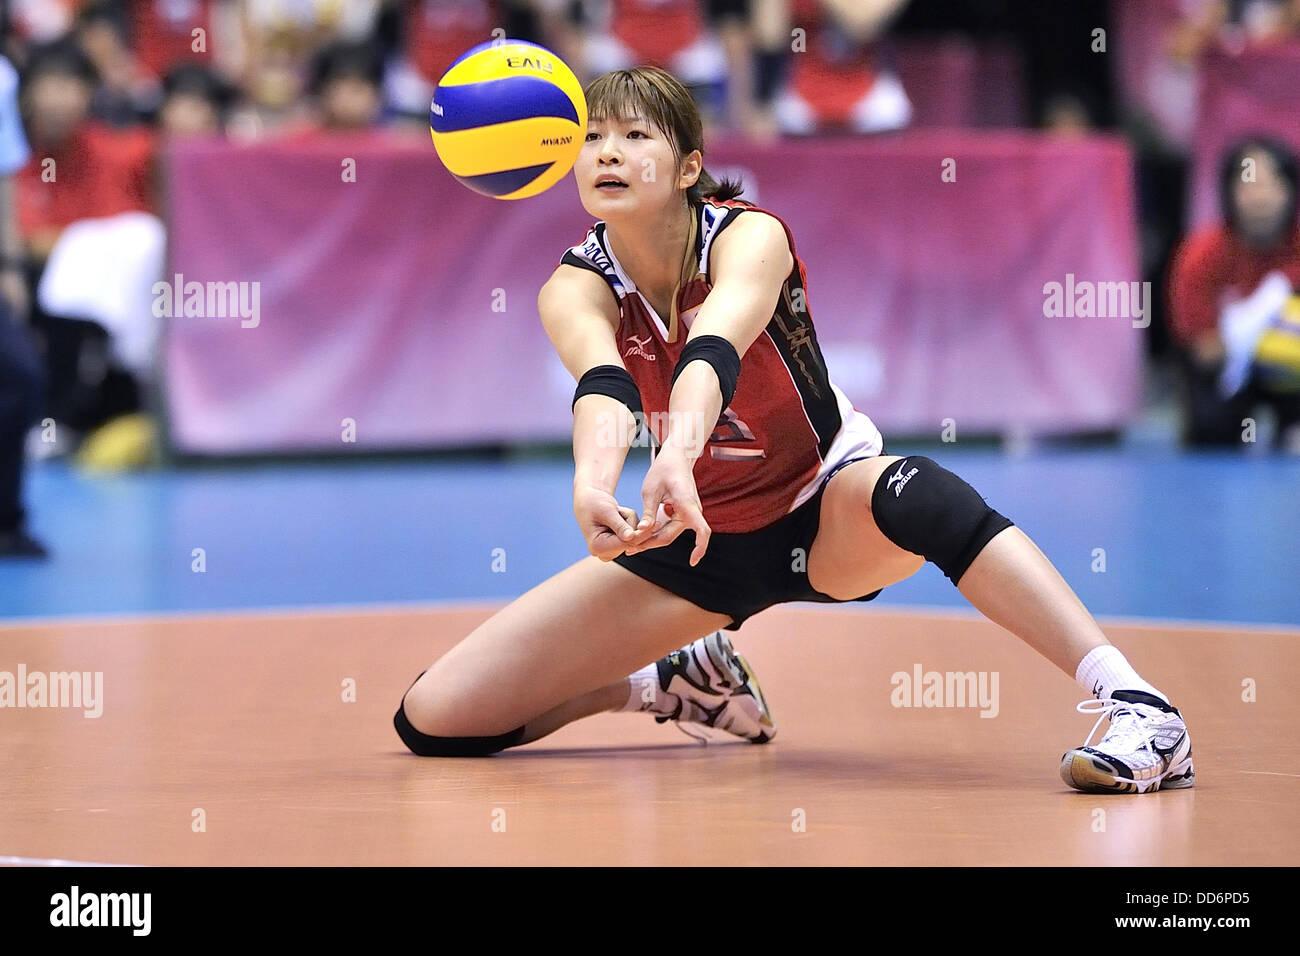 Saori Kimura (JPN), AUGUST 18, 2013 - Volleyball : 2013 FIVB World Grand Prix, Preliminary Round Week 3 Pool M match Japan 3-2 Czech Republic at Sendai Gymnasium in Sendai, Miyagi, Japan. (Photo by Ryu Makino/AFLO) Stock Photo